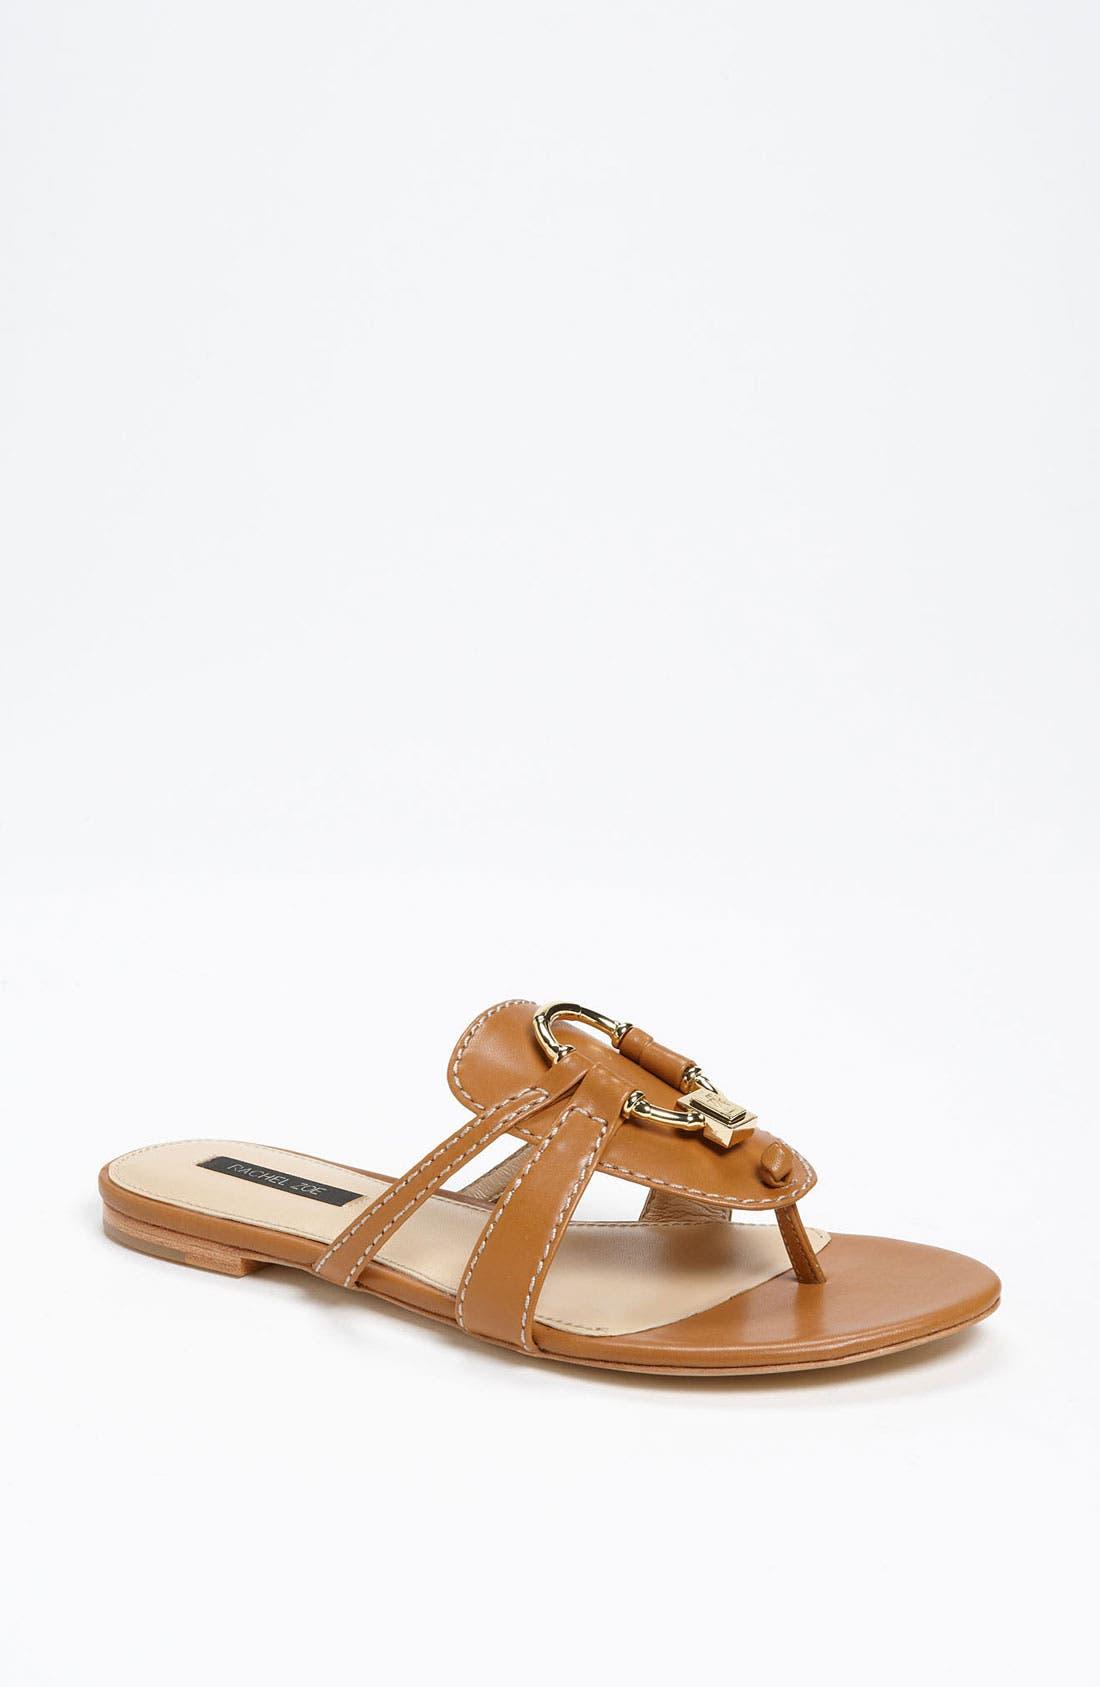 Alternate Image 1 Selected - Rachel Zoe 'Gina' Flat Sandal